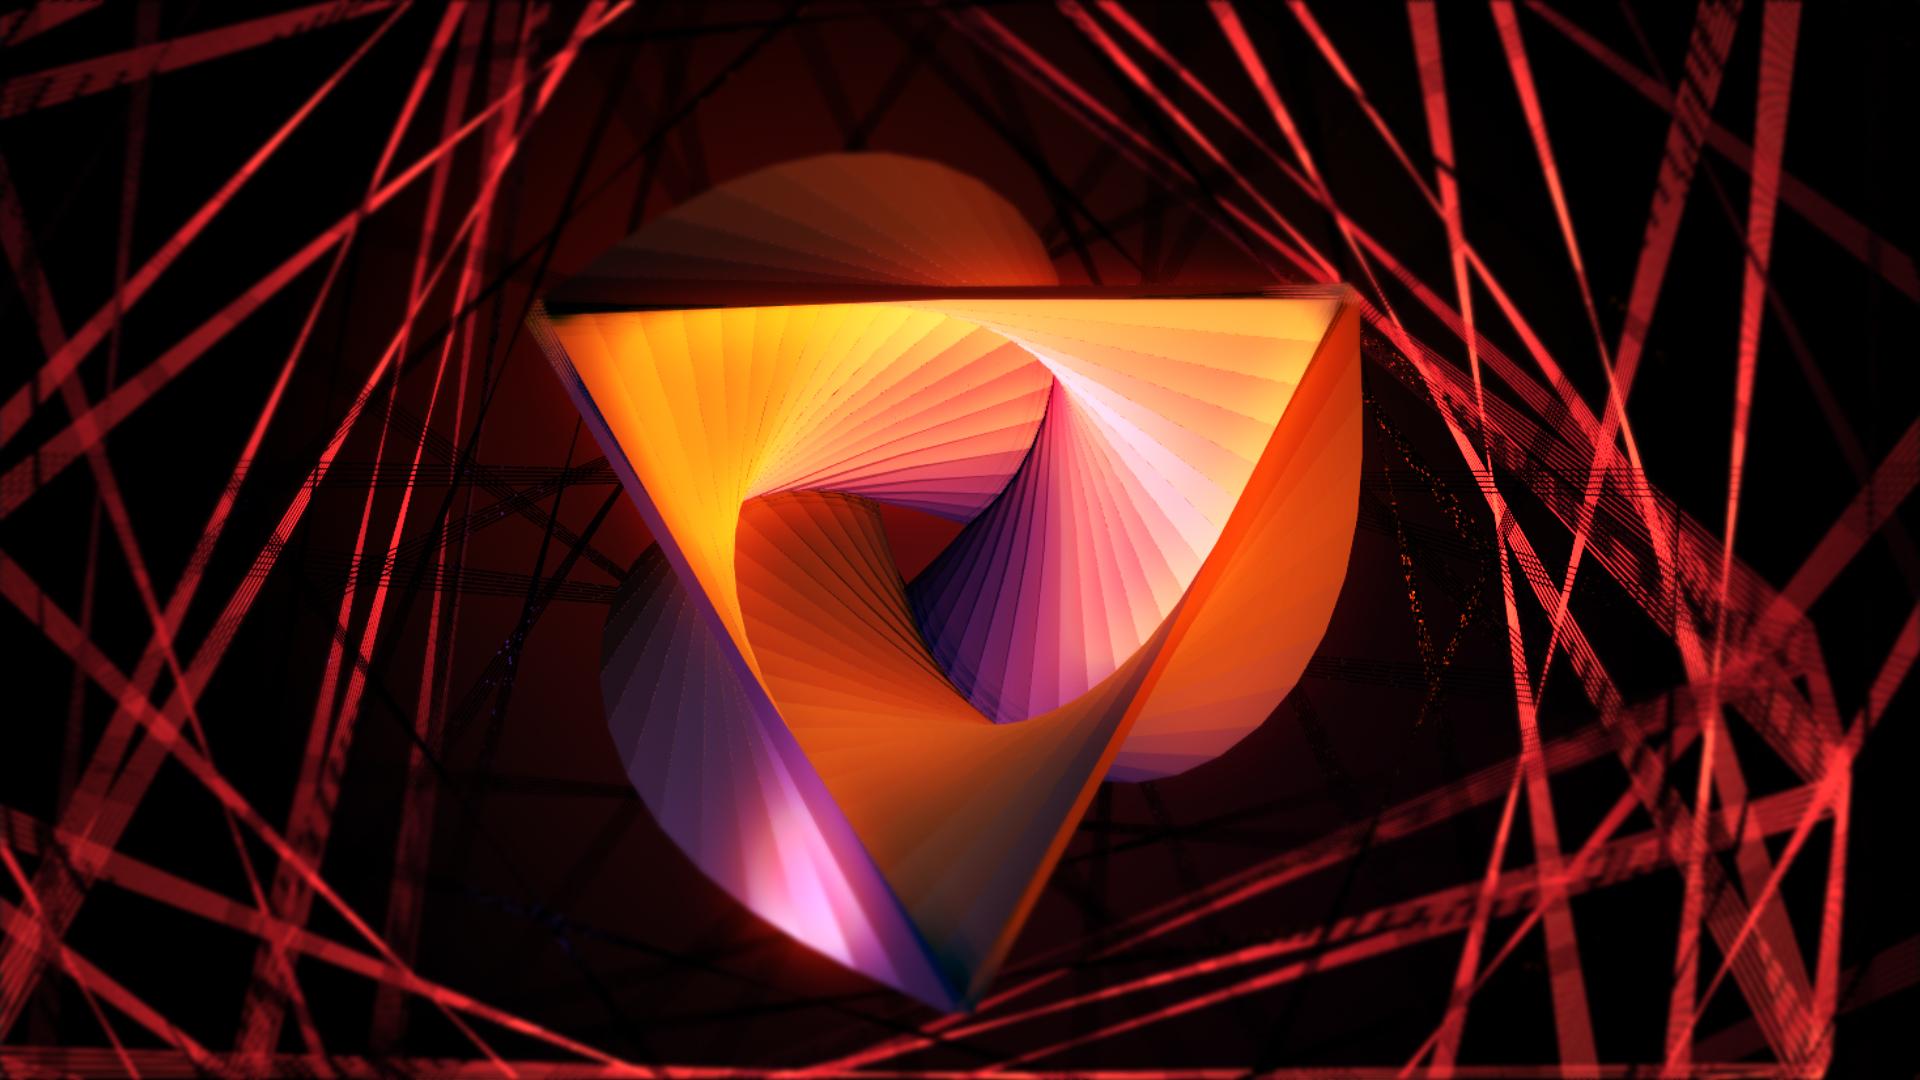 Geometric Vj Loops